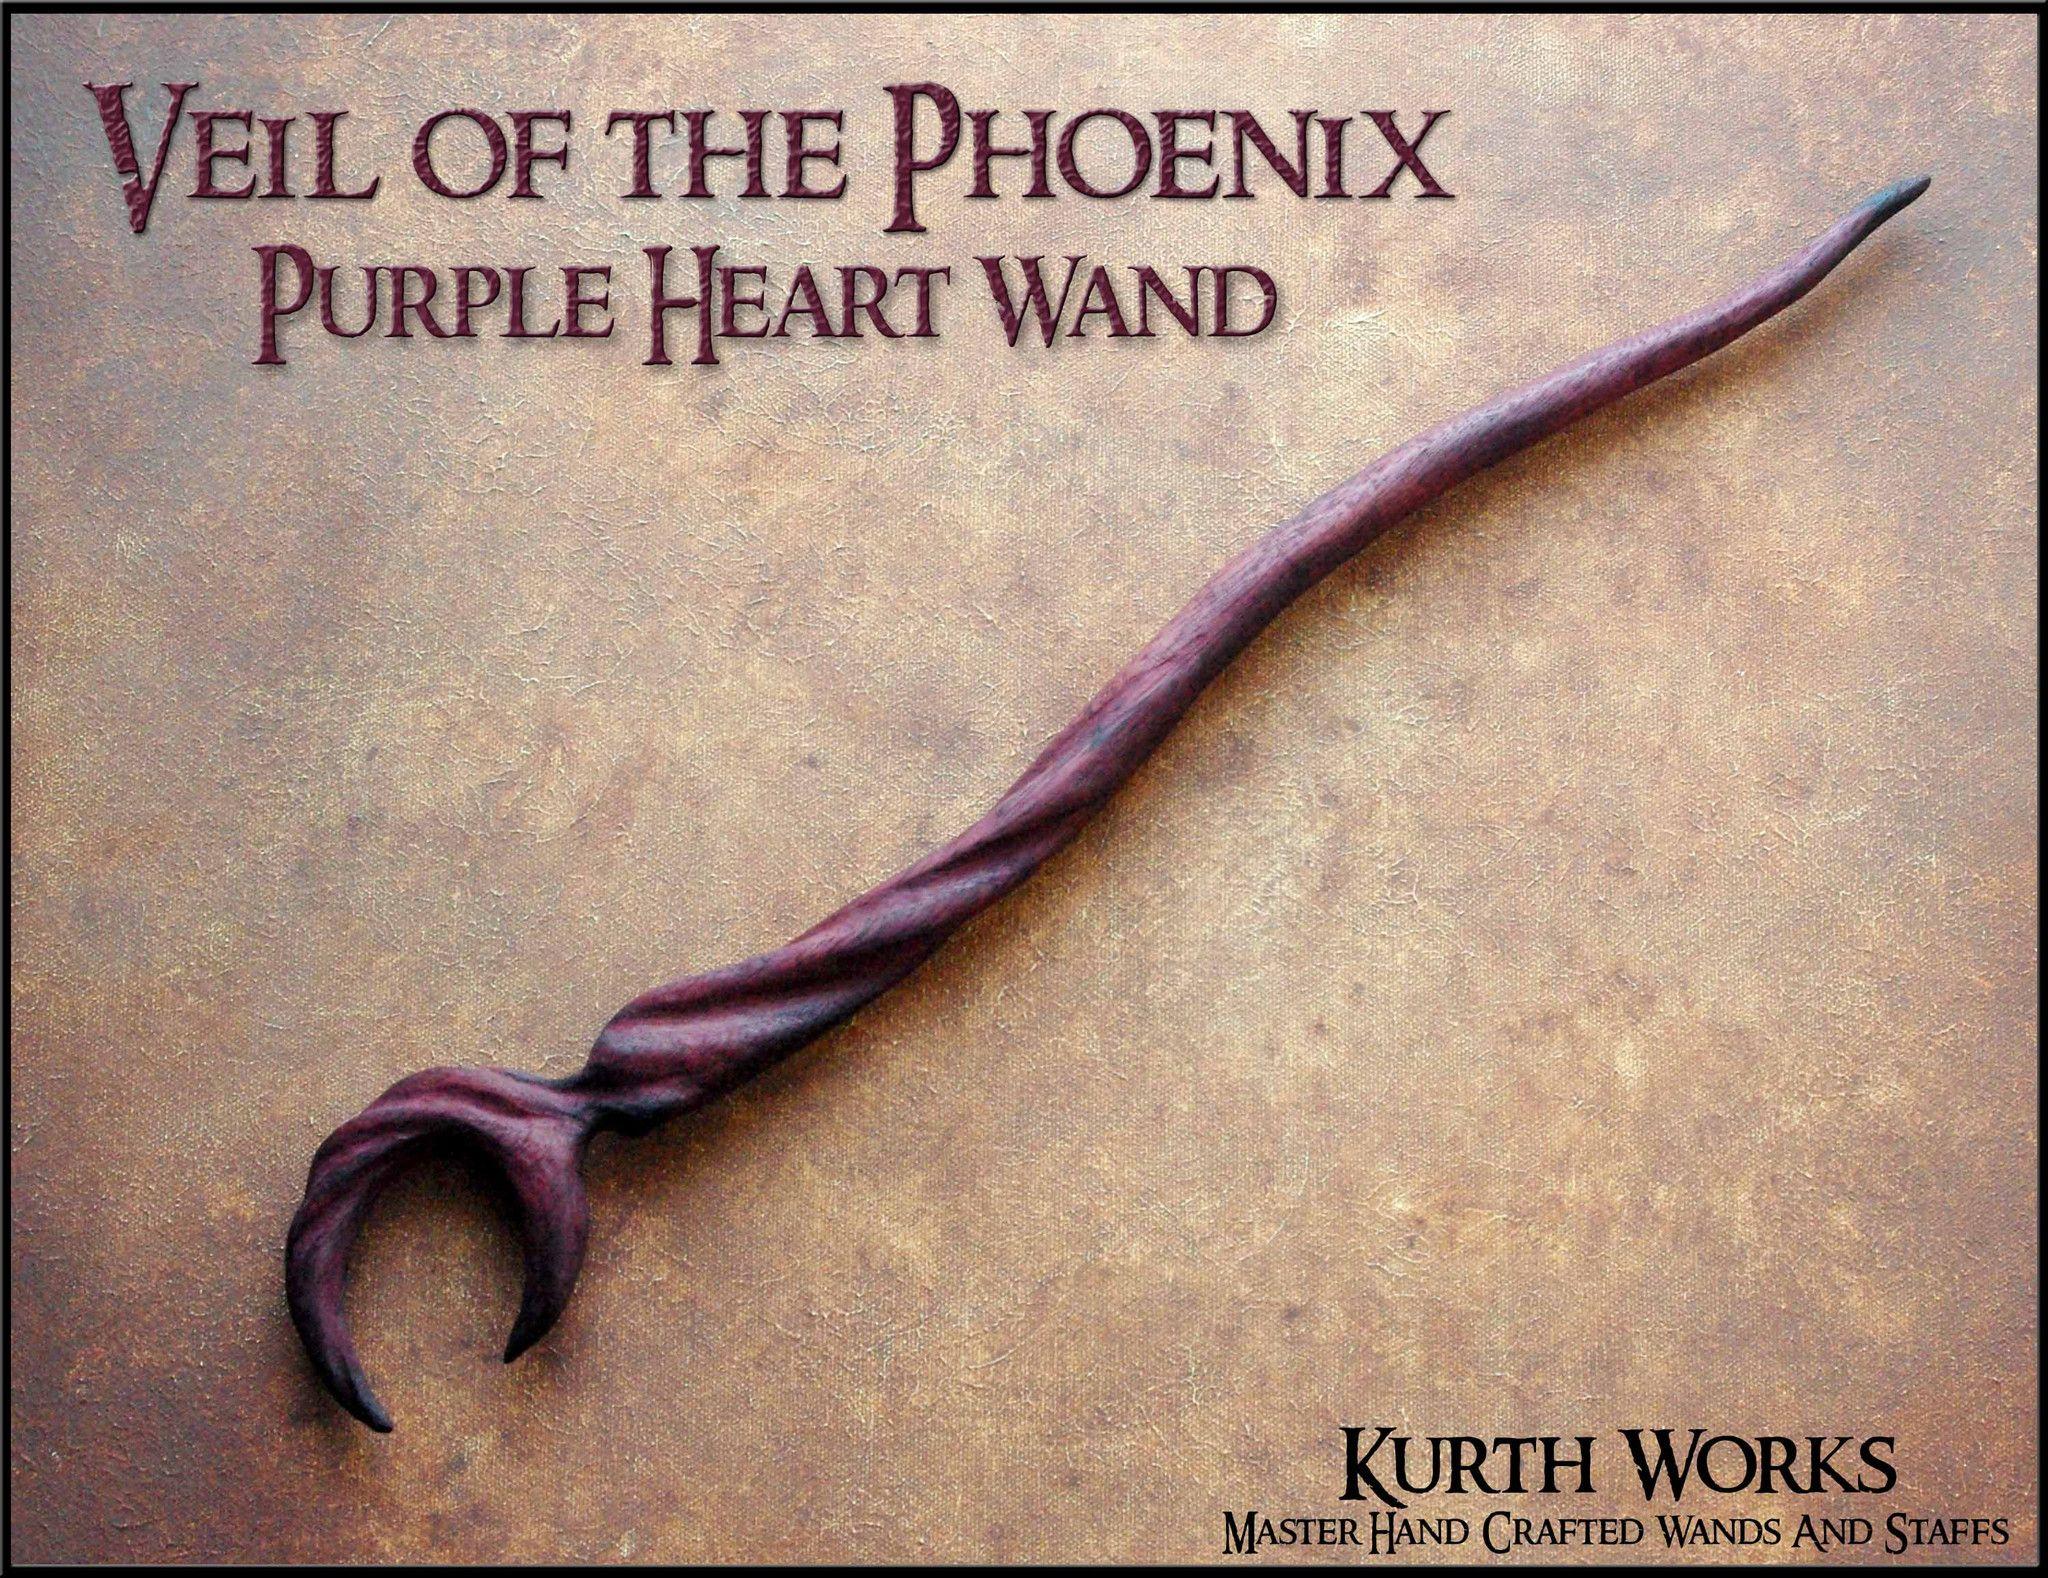 Wooden staff designs kurth works custom hand carved magic wizard wands - Veil Of The Phoenix Purple Heart Wizard Magic Wooden Wand